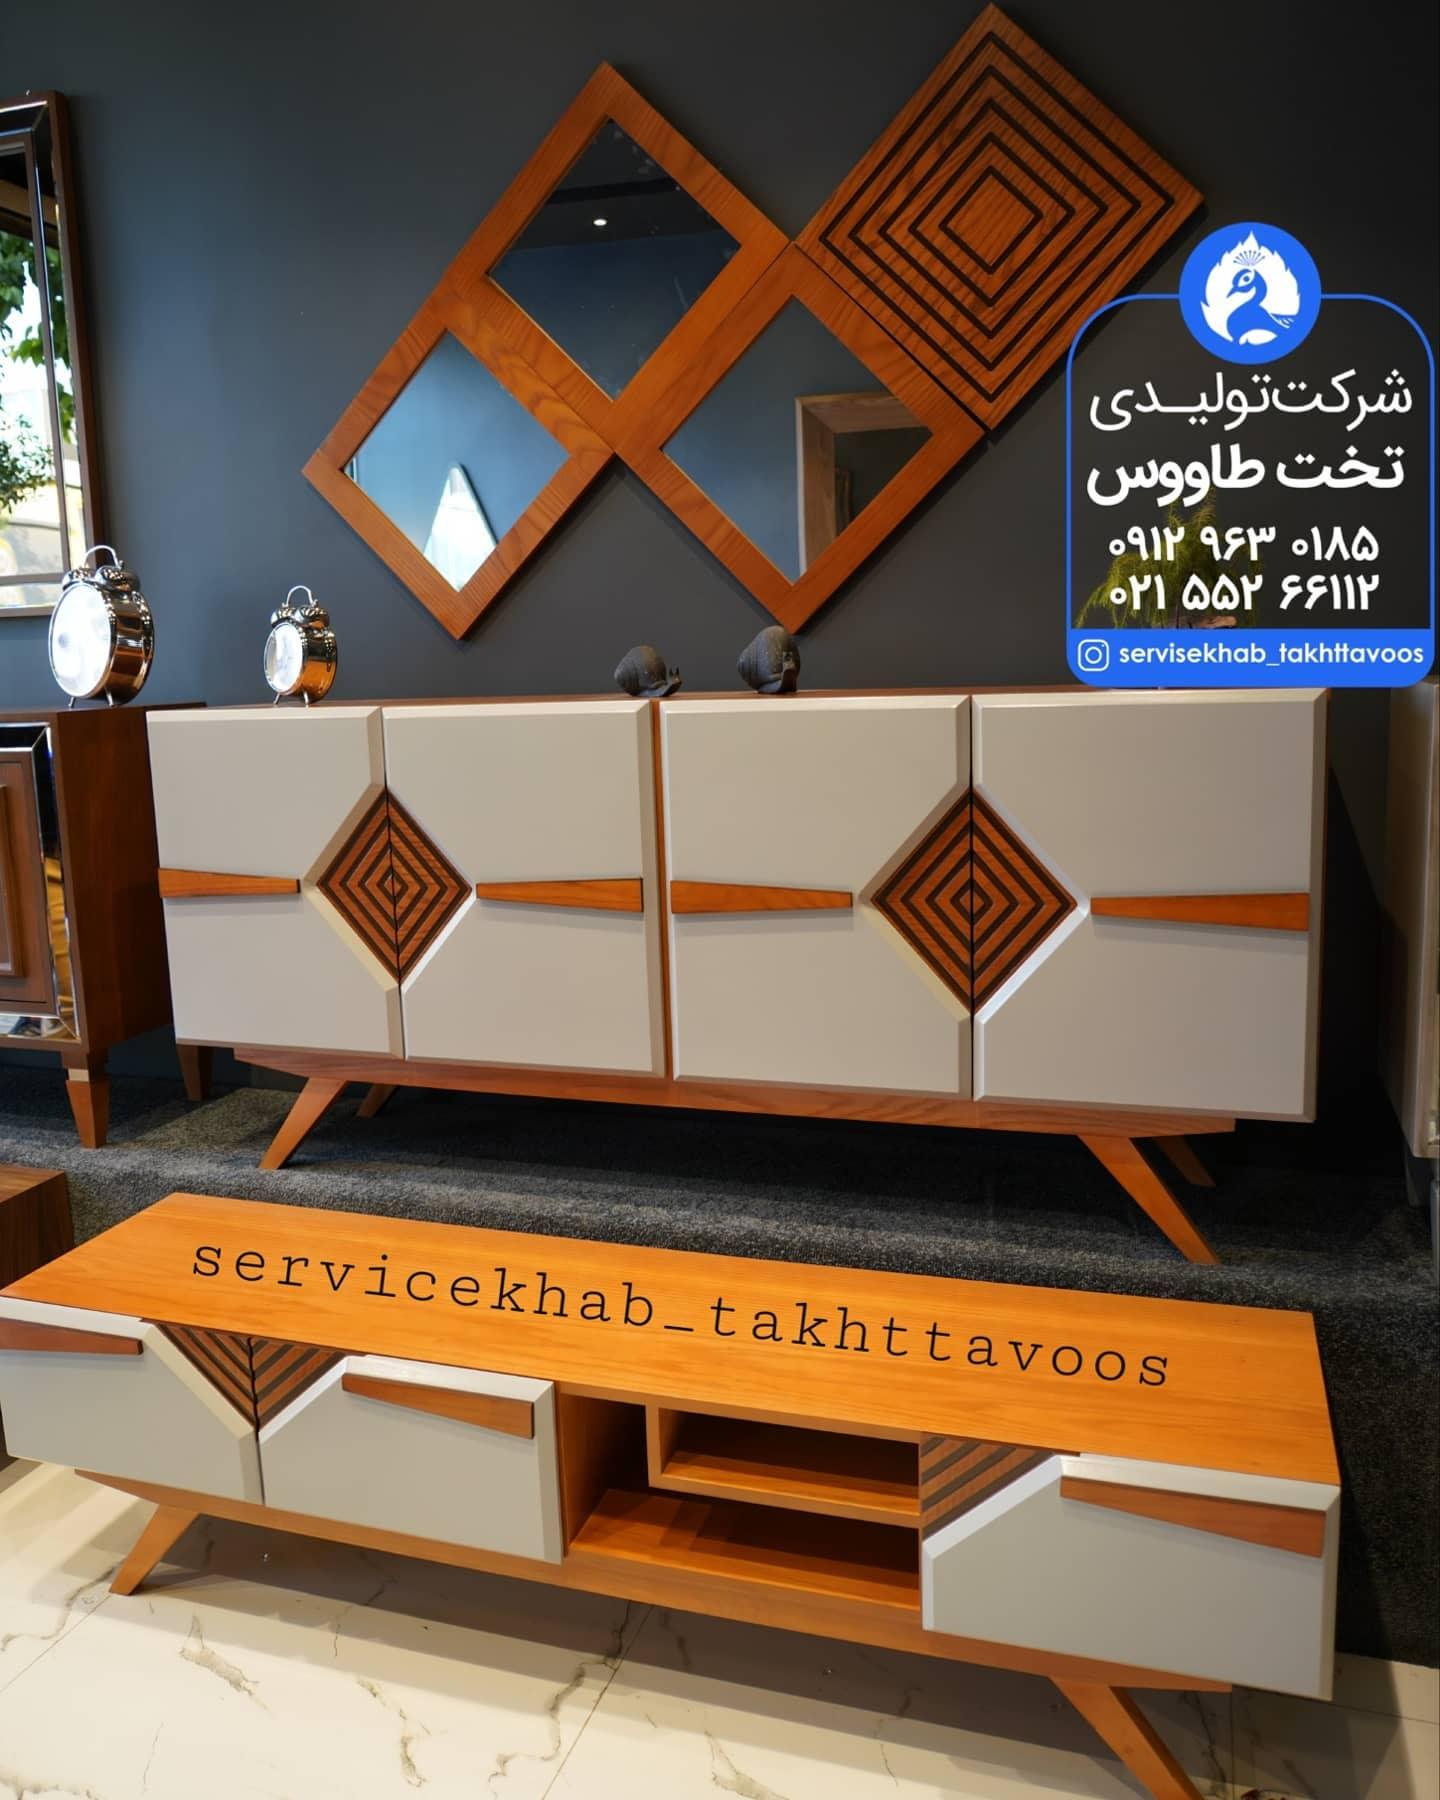 servicekhab_takhttavoos-20210912-0025